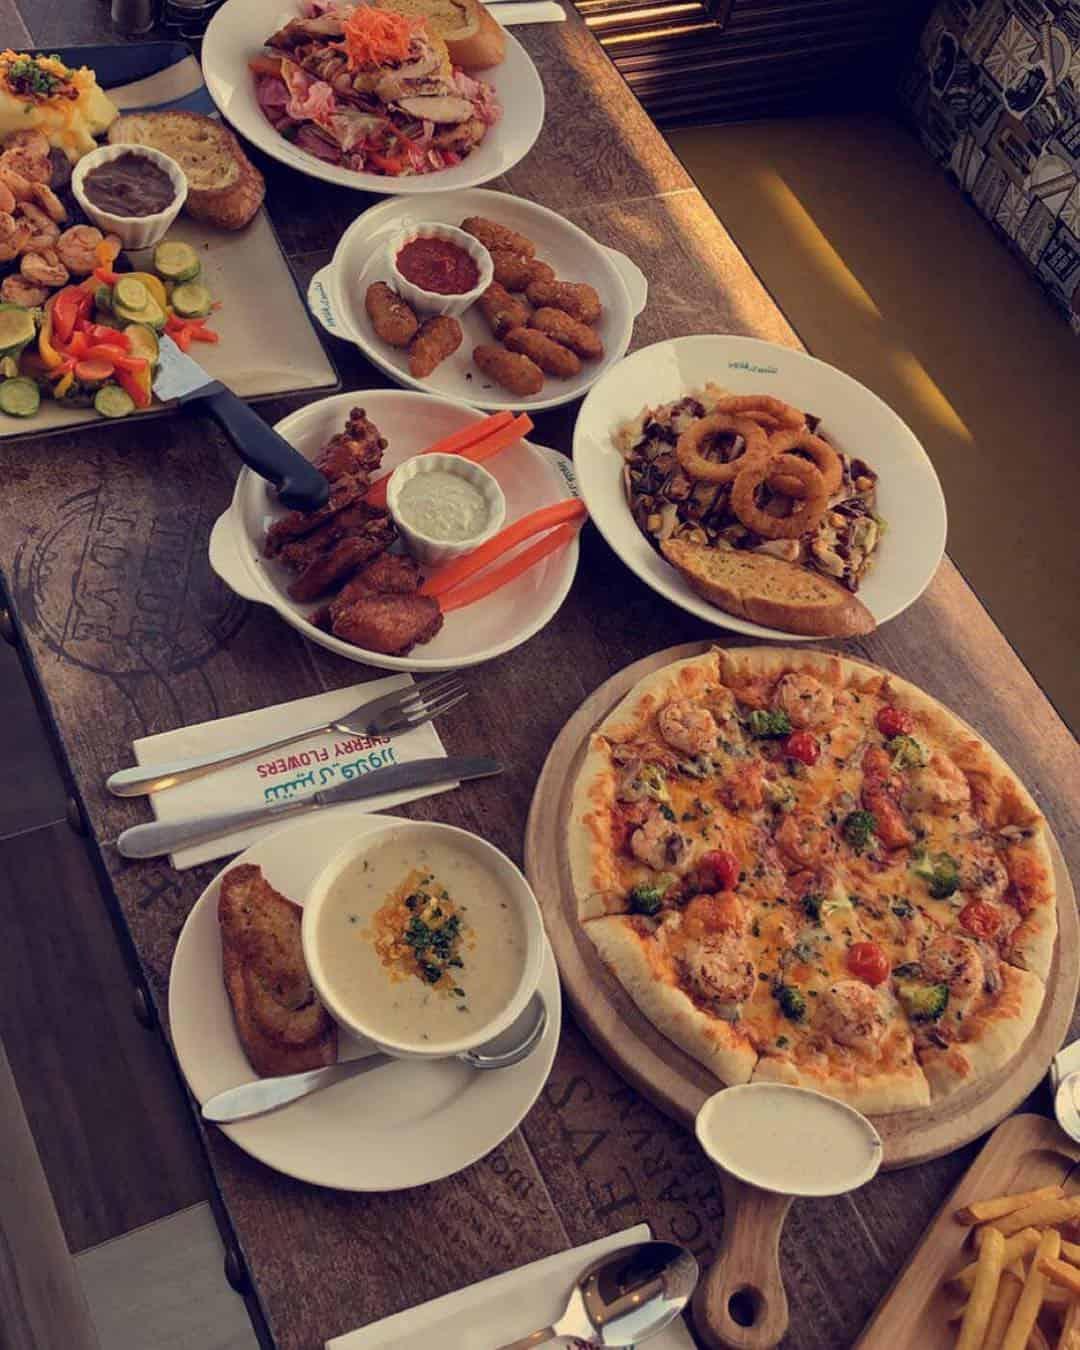 مطعم تشيري فلاورز في أبها